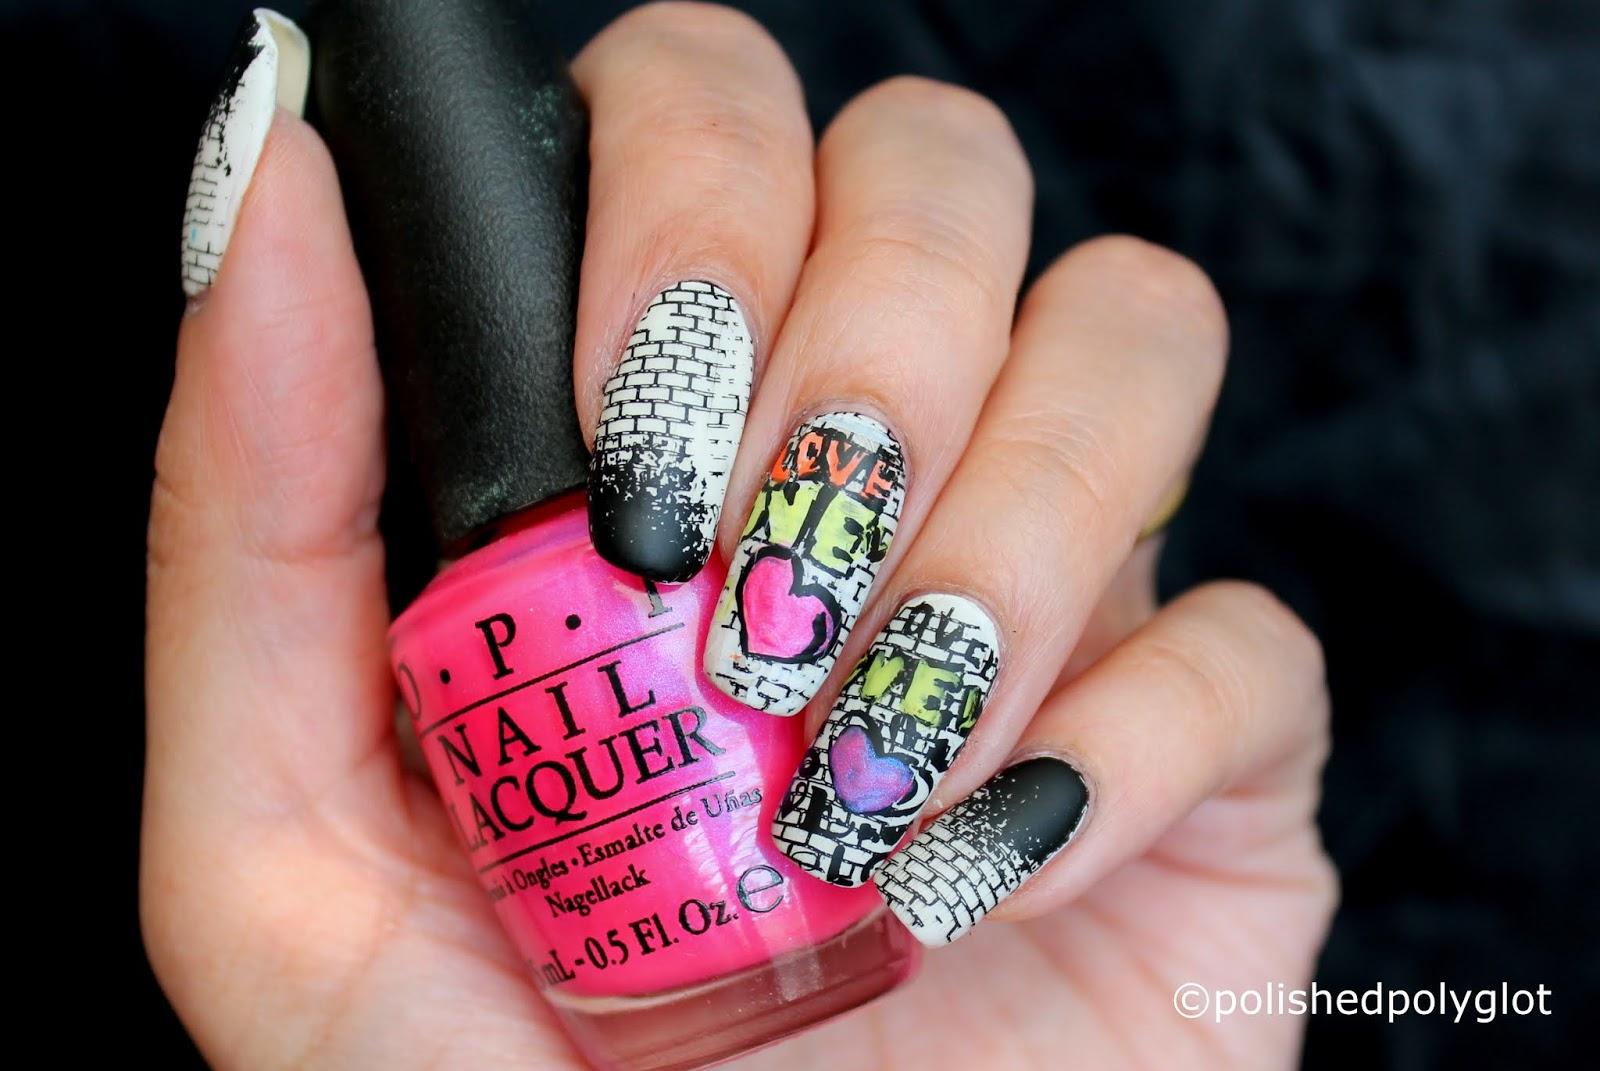 Nail Art │ Graffiti Nails [26 Great Nail Art Ideas] / Polished Polyglot